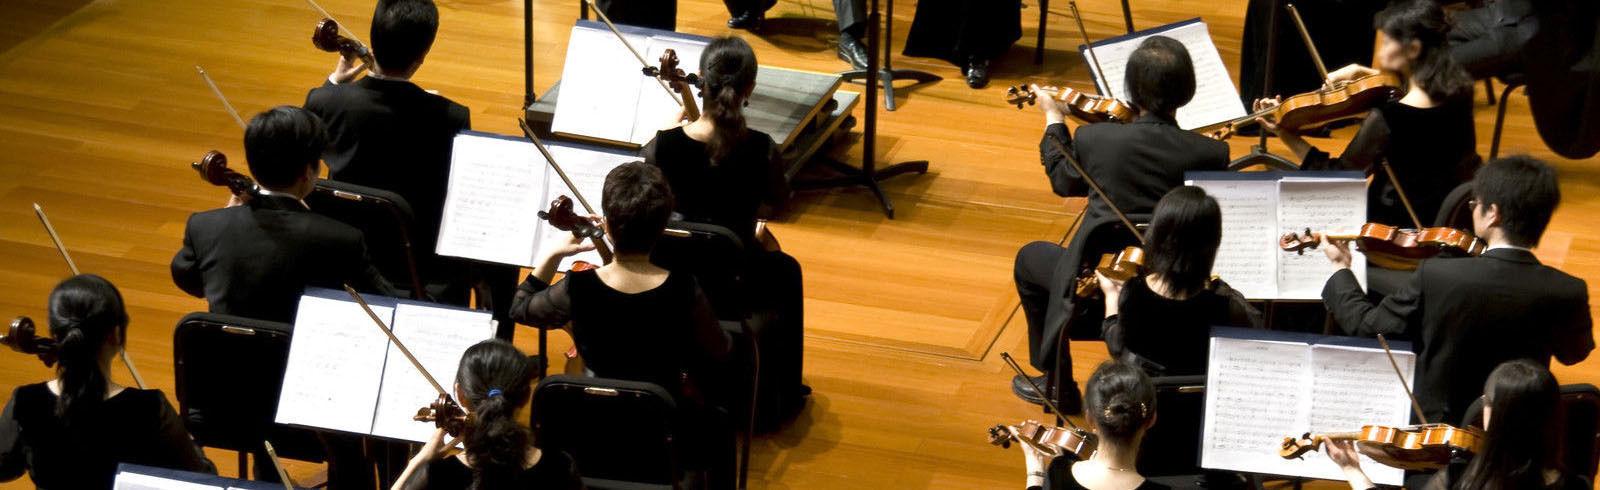 Boston Symphony Orchestra - Altinoglu conducts Berlioz, Lalo, Dutilleux and Roussel Boston